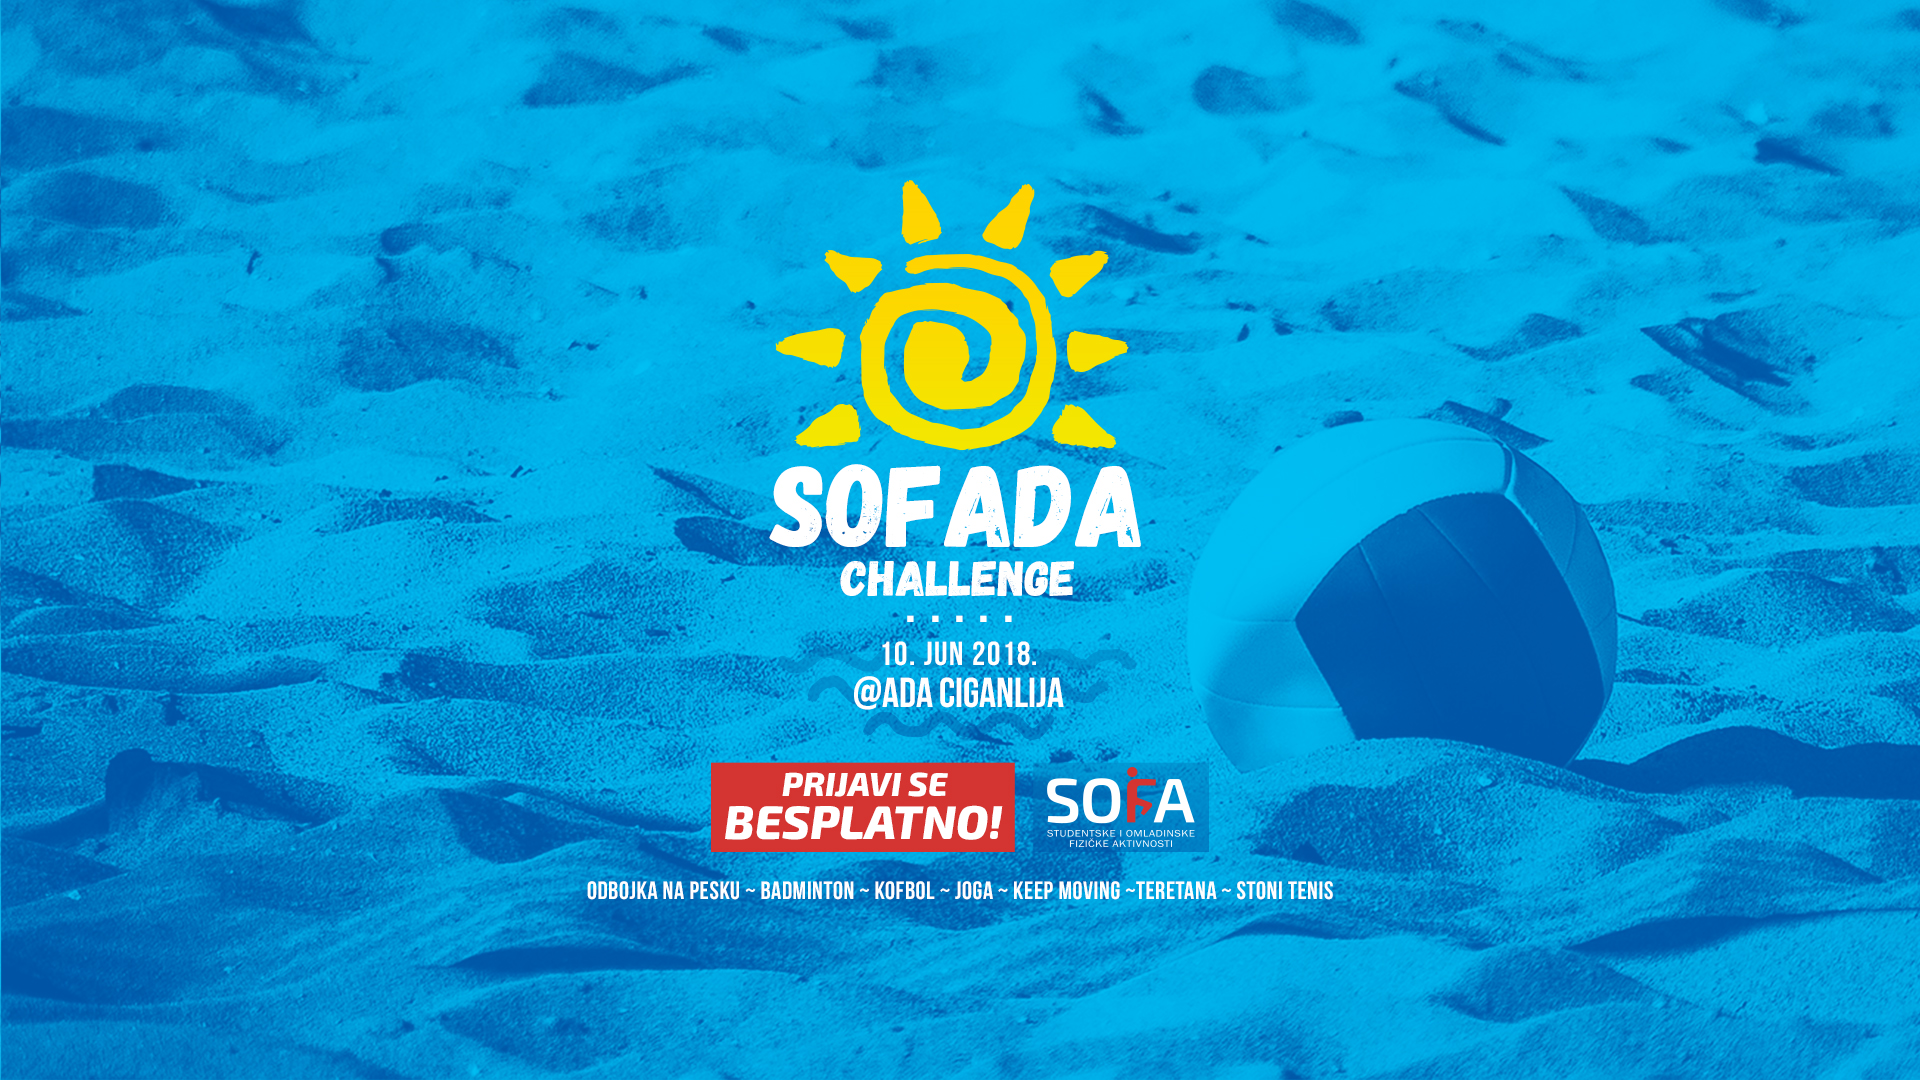 SOFADA CHALLENGE; Ada Ciganlija; Foto sofa.rs